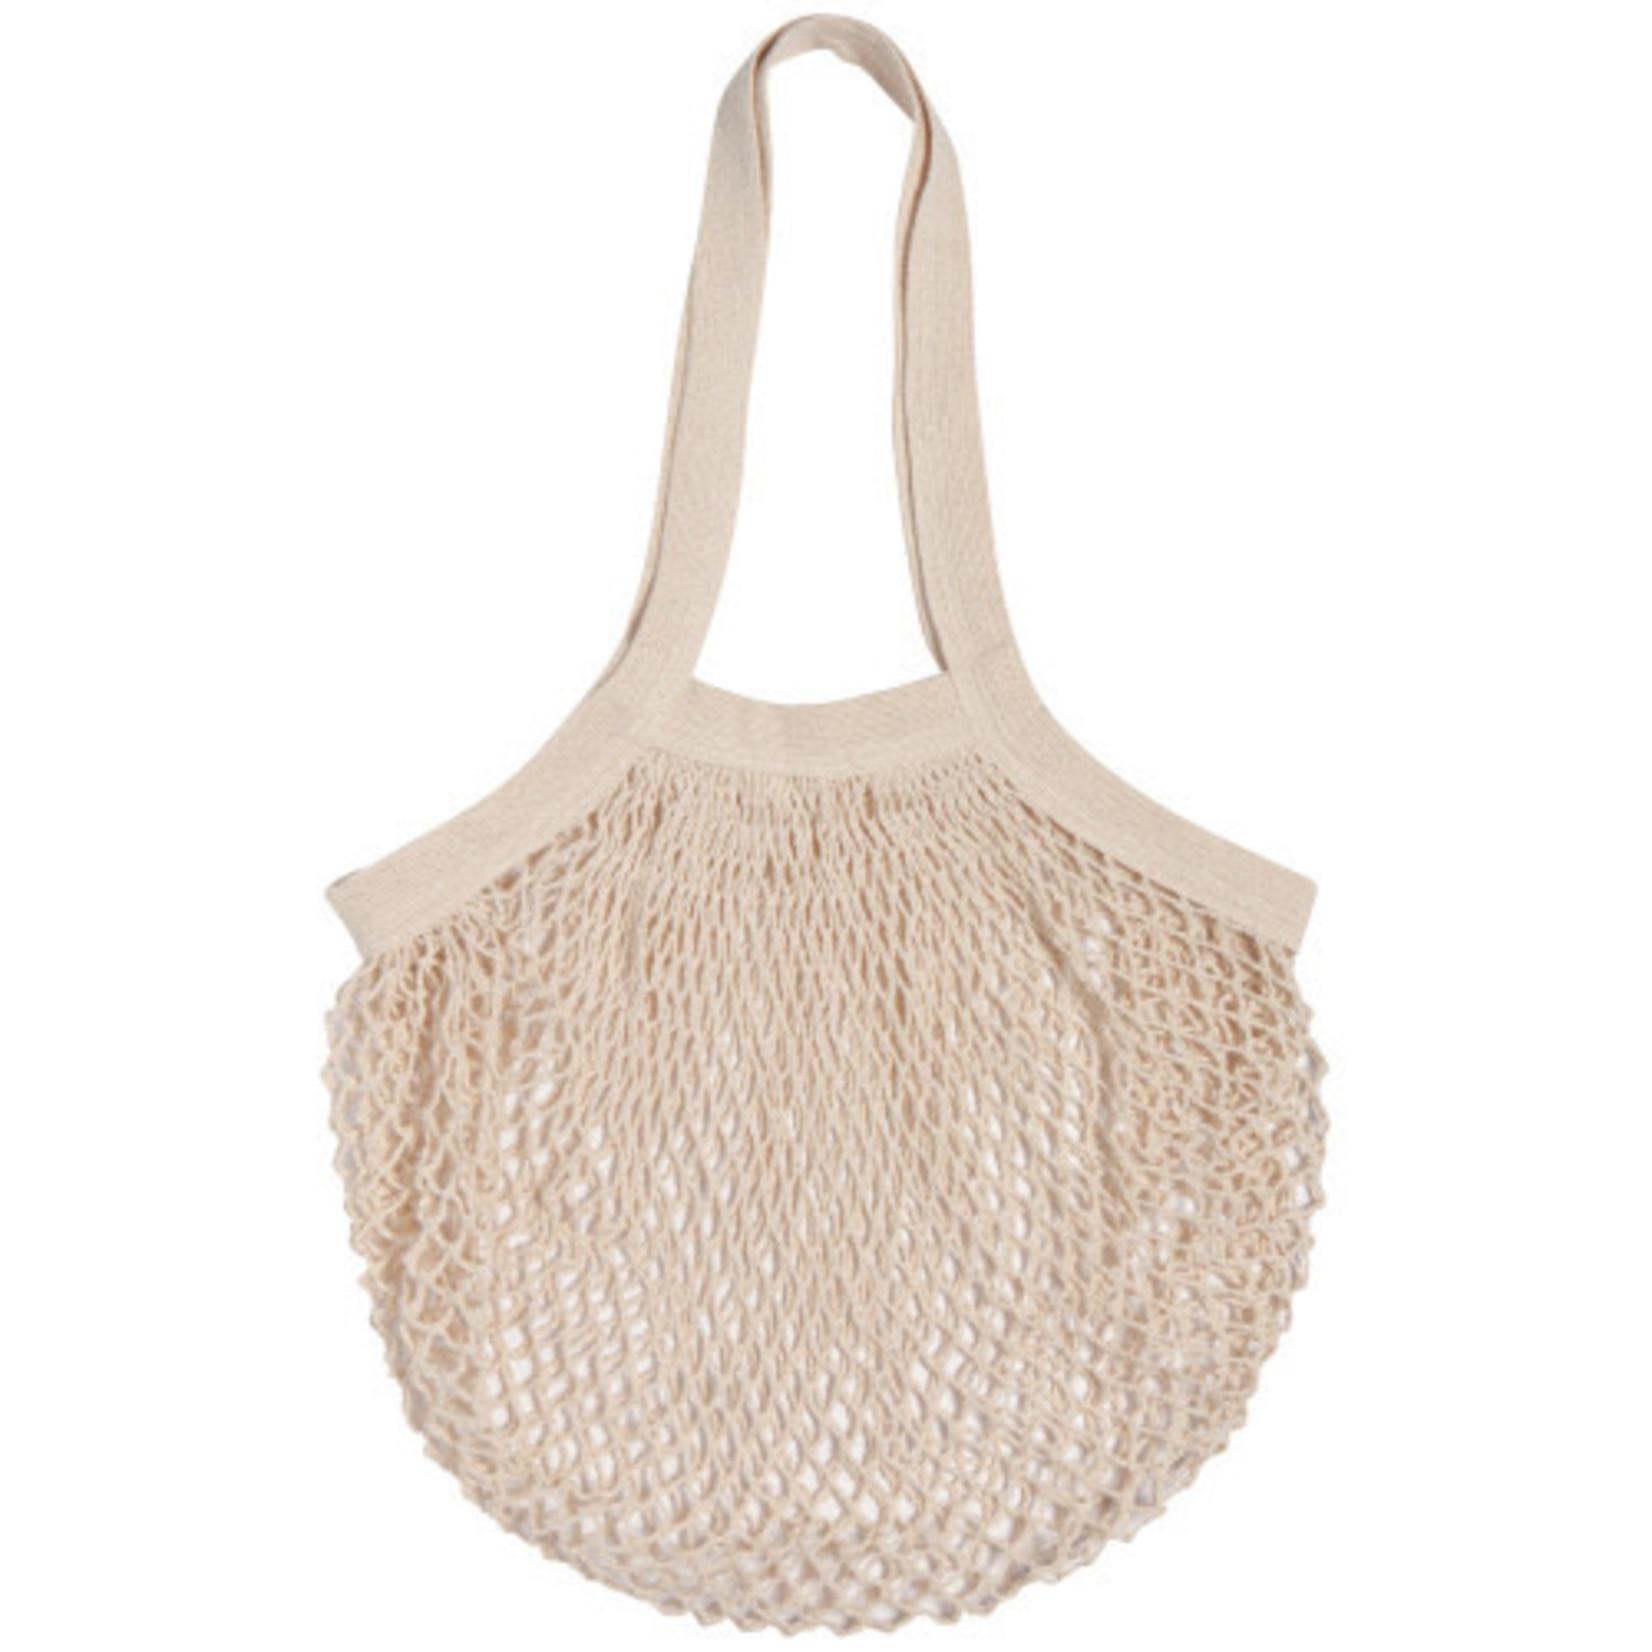 Danica Shopping Bag Le Marche Natural